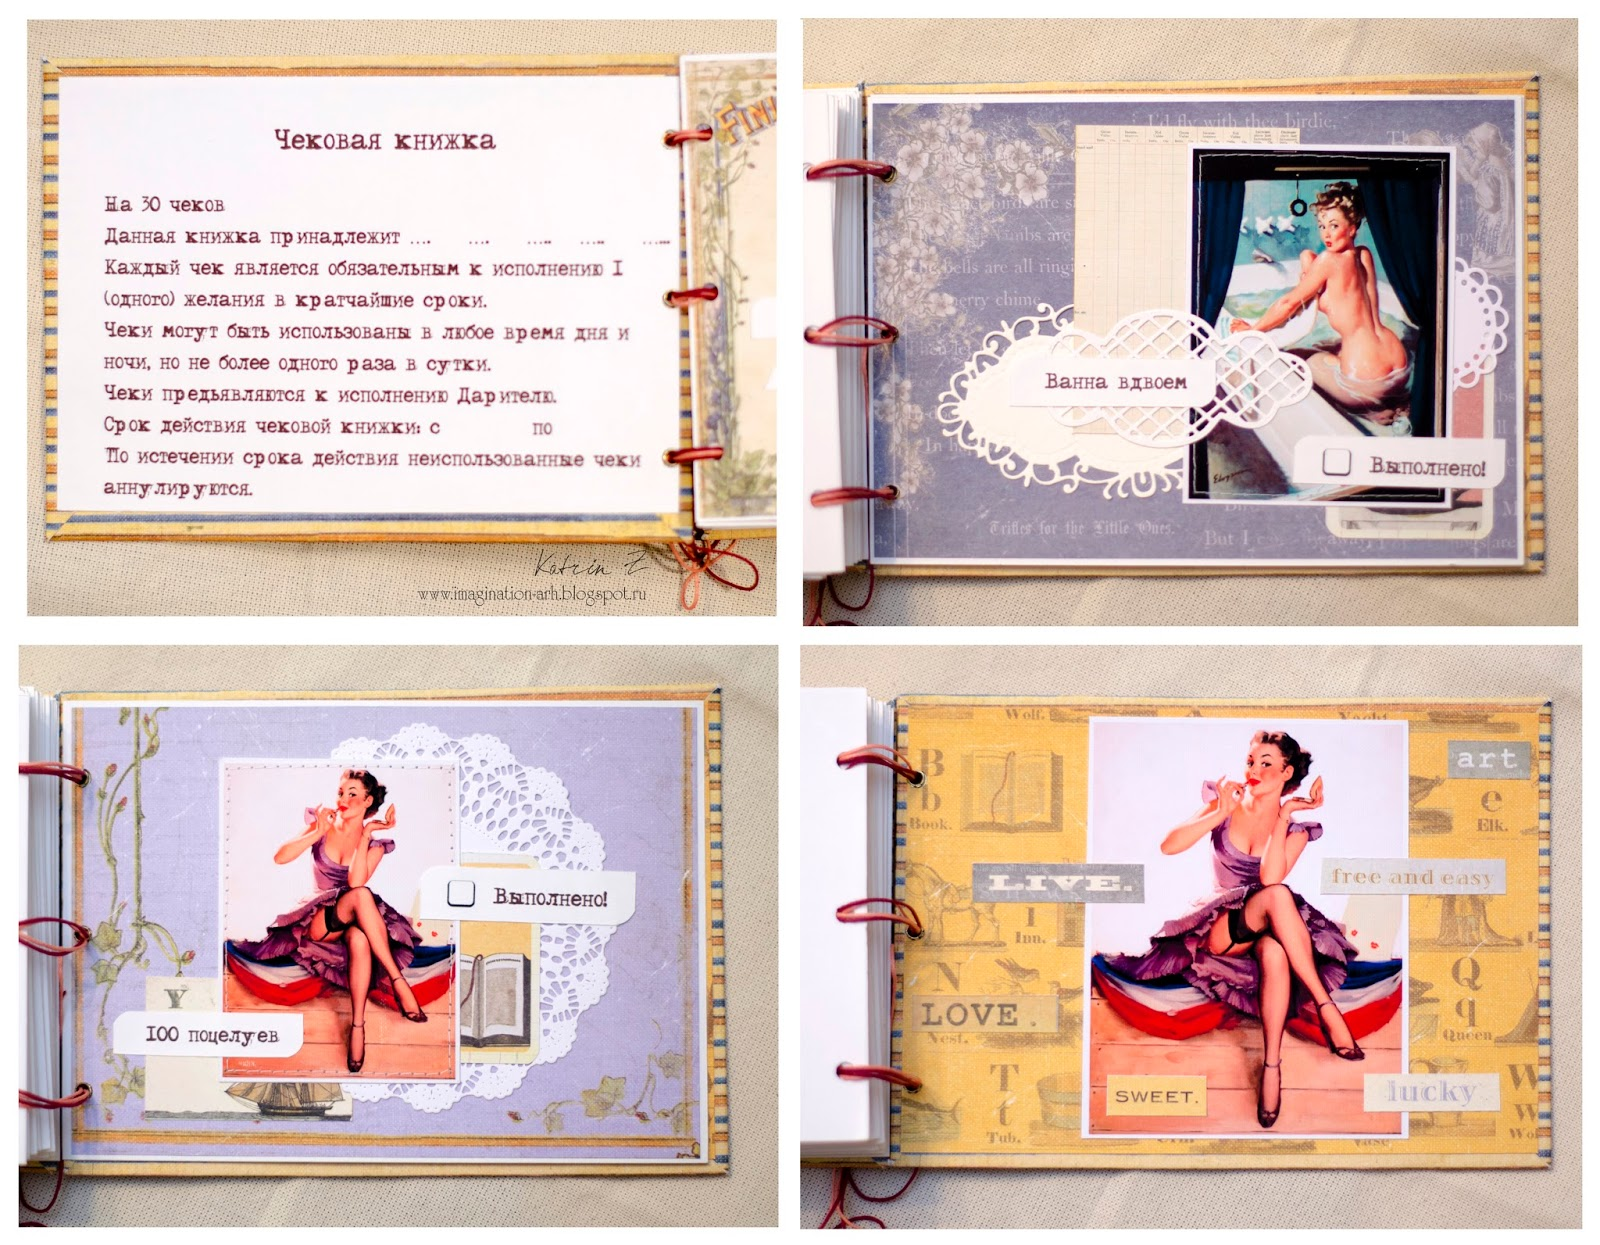 Куклы для исполнения желаний - куклы обереги, славянские 32